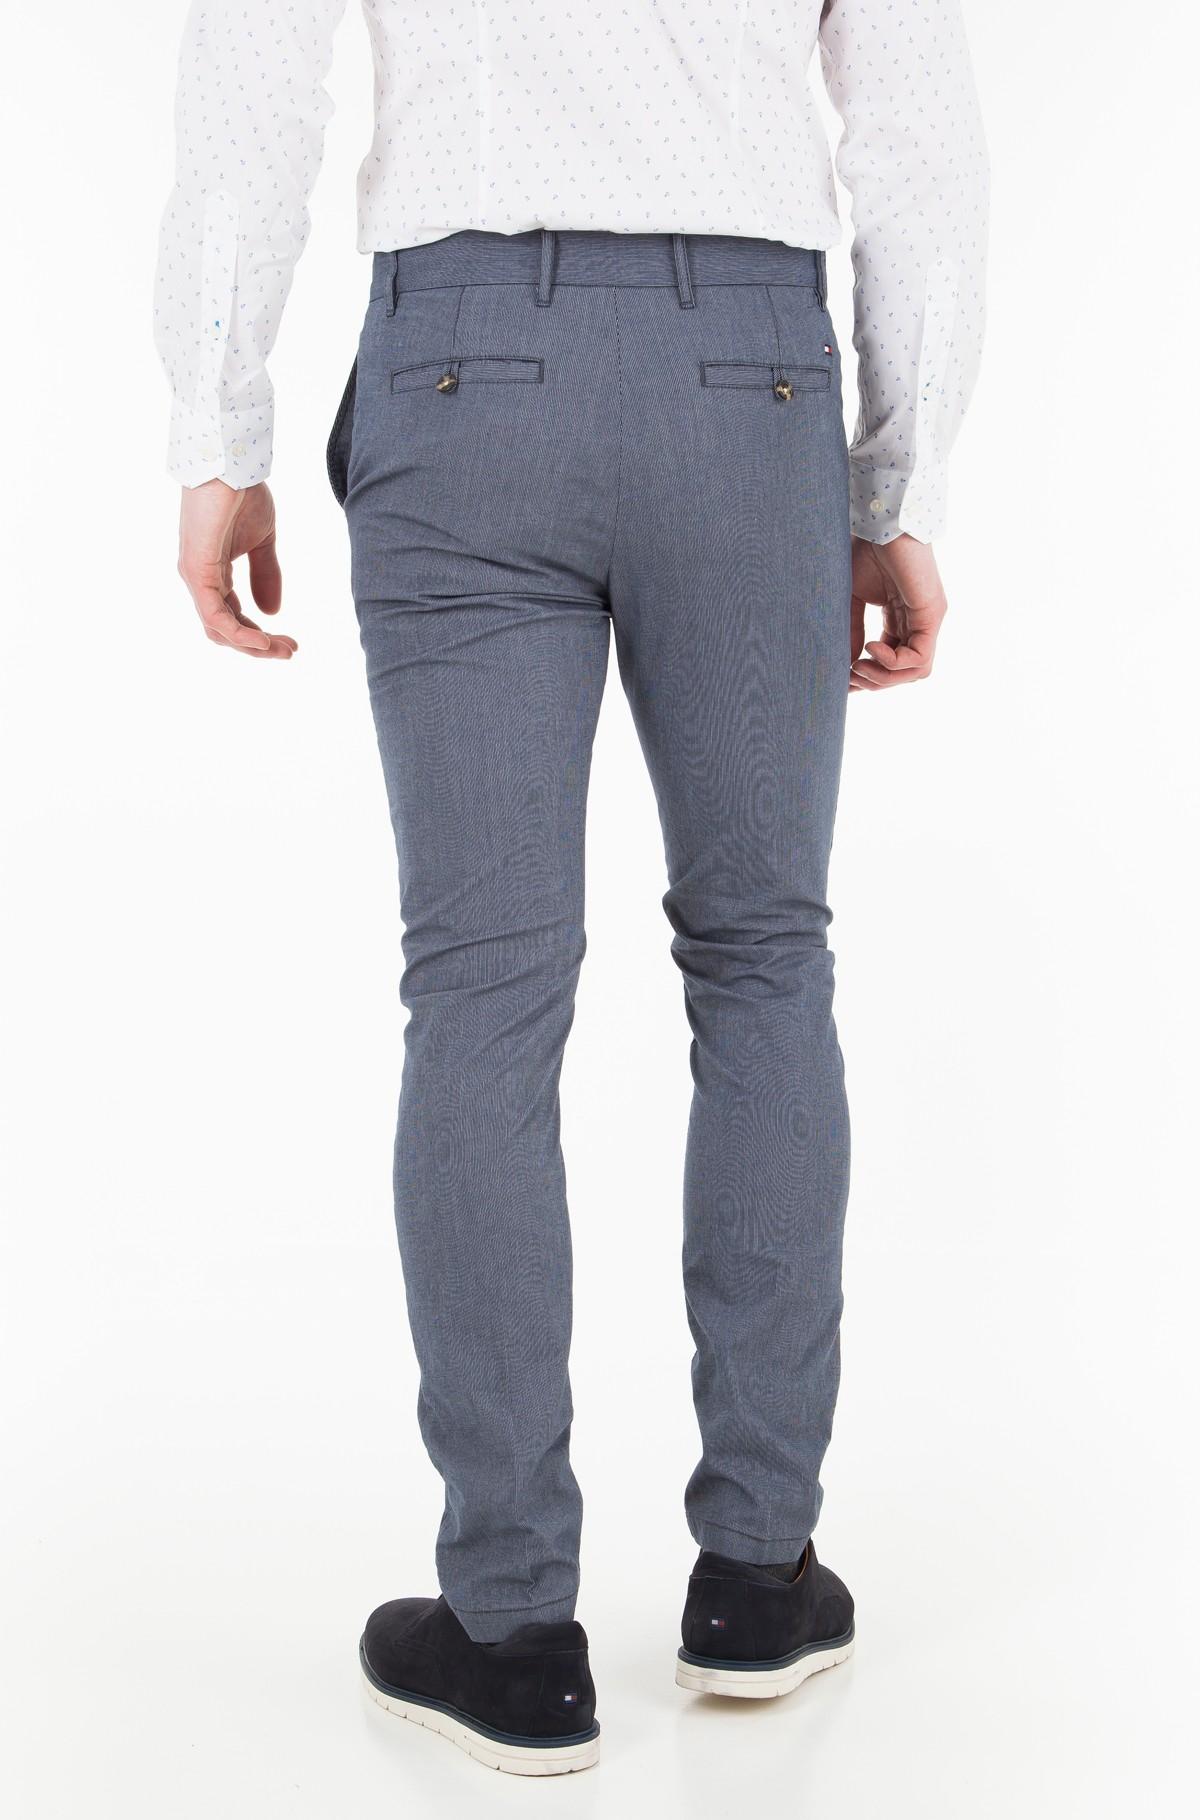 Trousers Denton Chino Str Lt Wt Yd Stripe-full-2